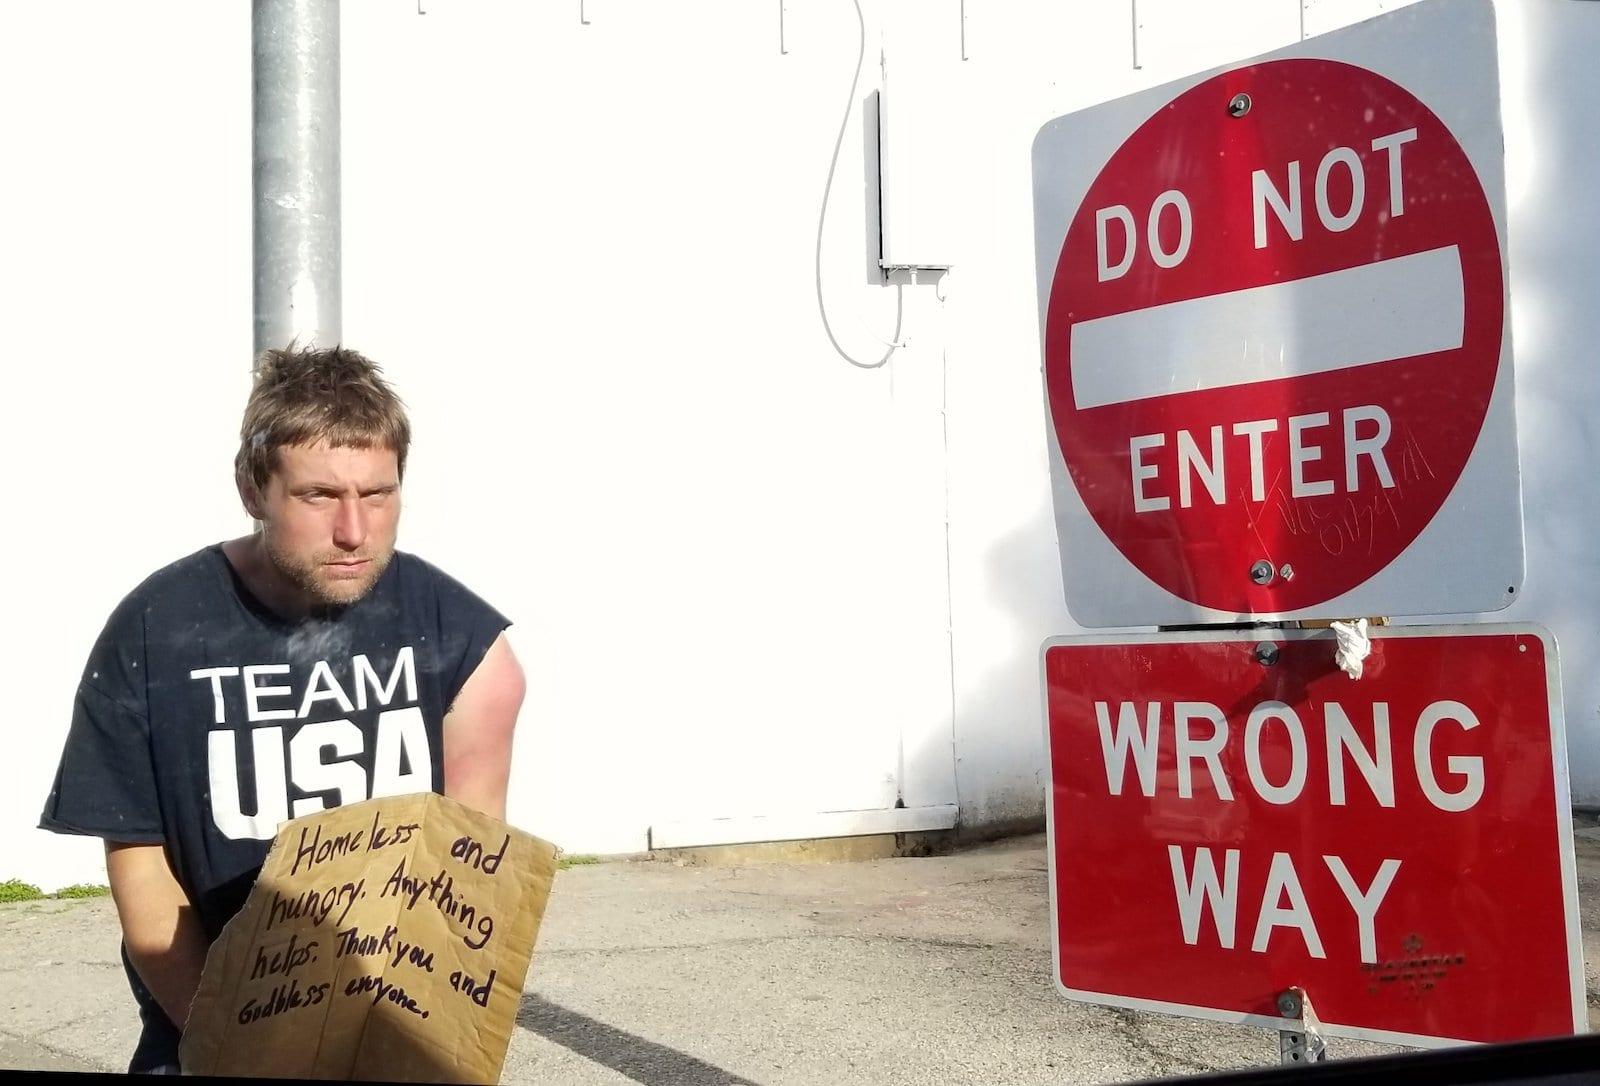 Opioid Abuse Crisis Homeless Man Dog Not Enter Sign